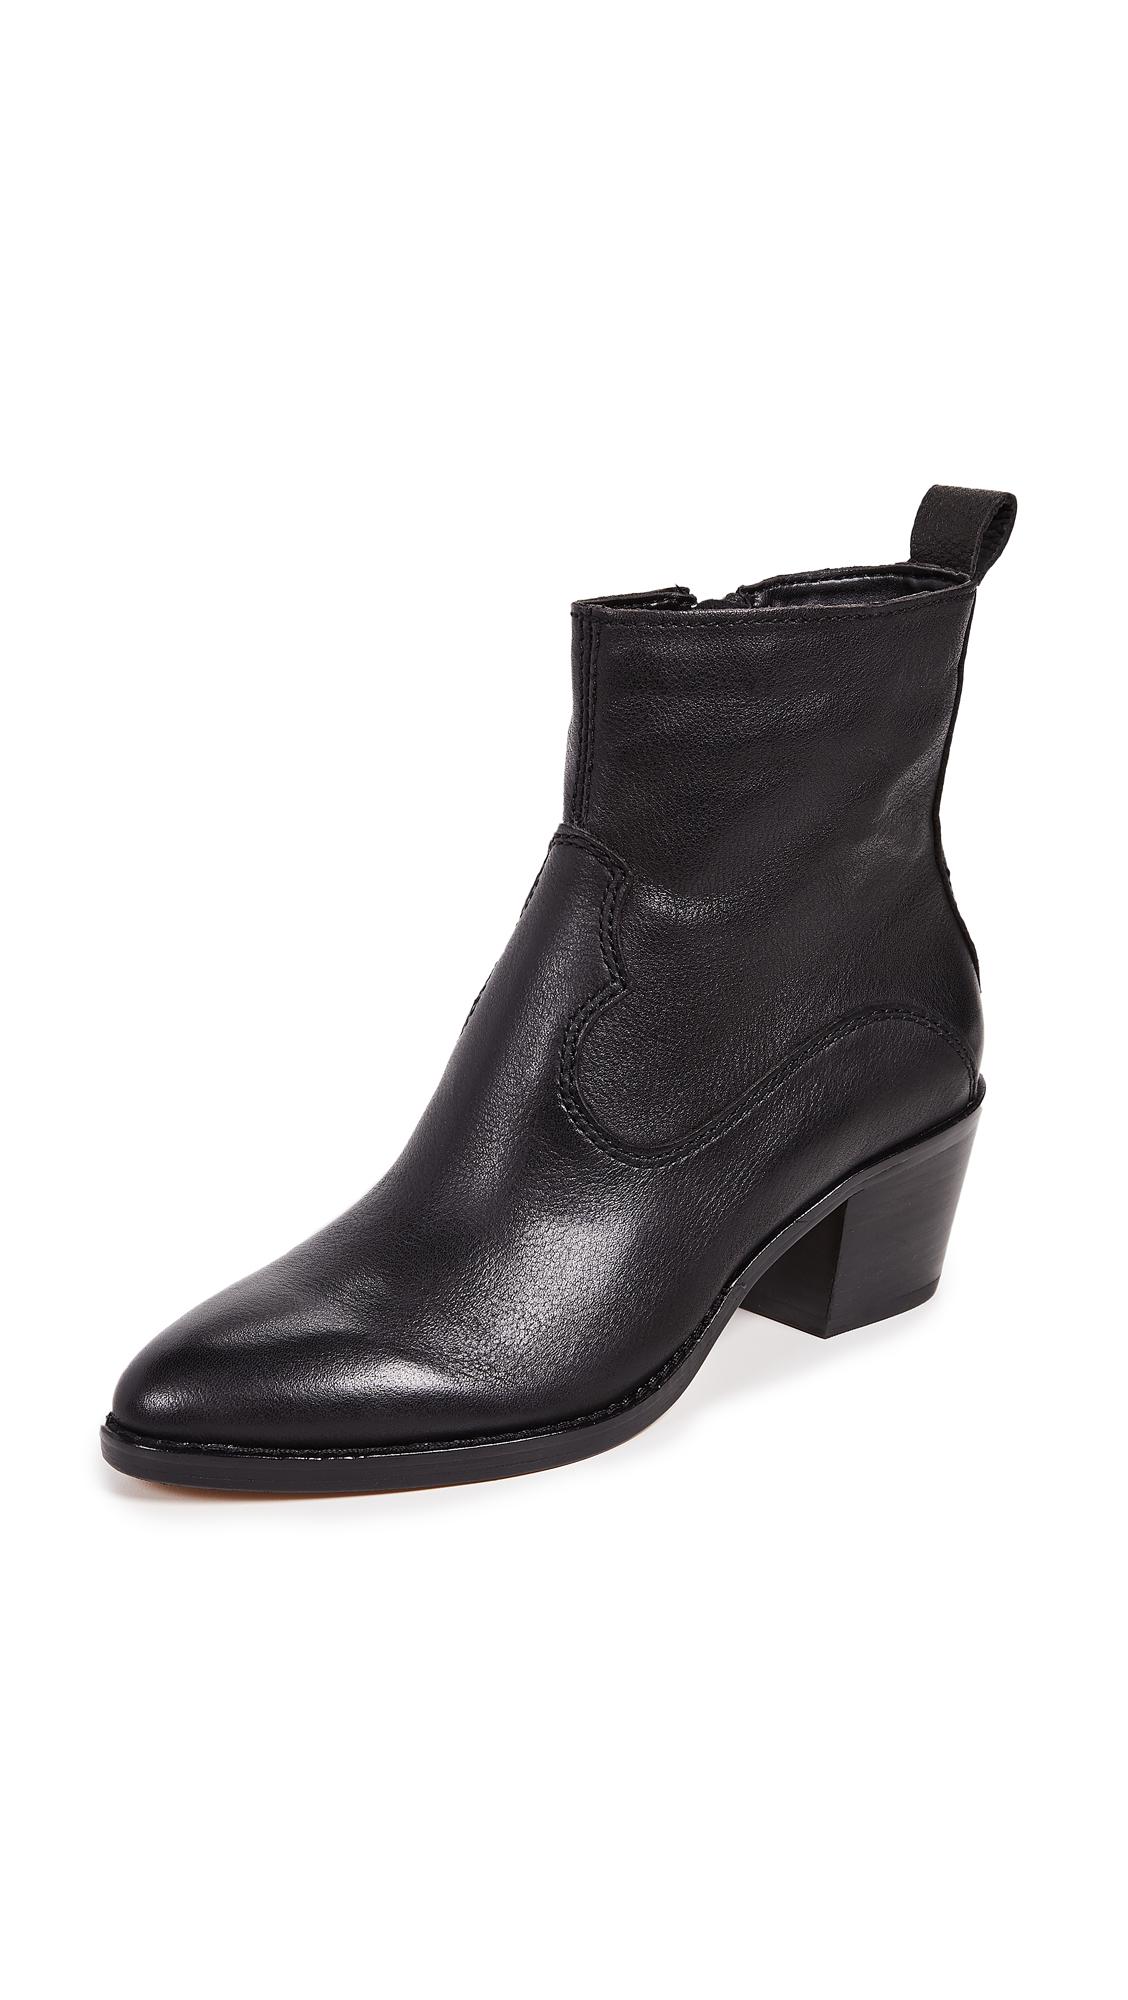 Dolce Vita Daliss Block Heel Booties - Black